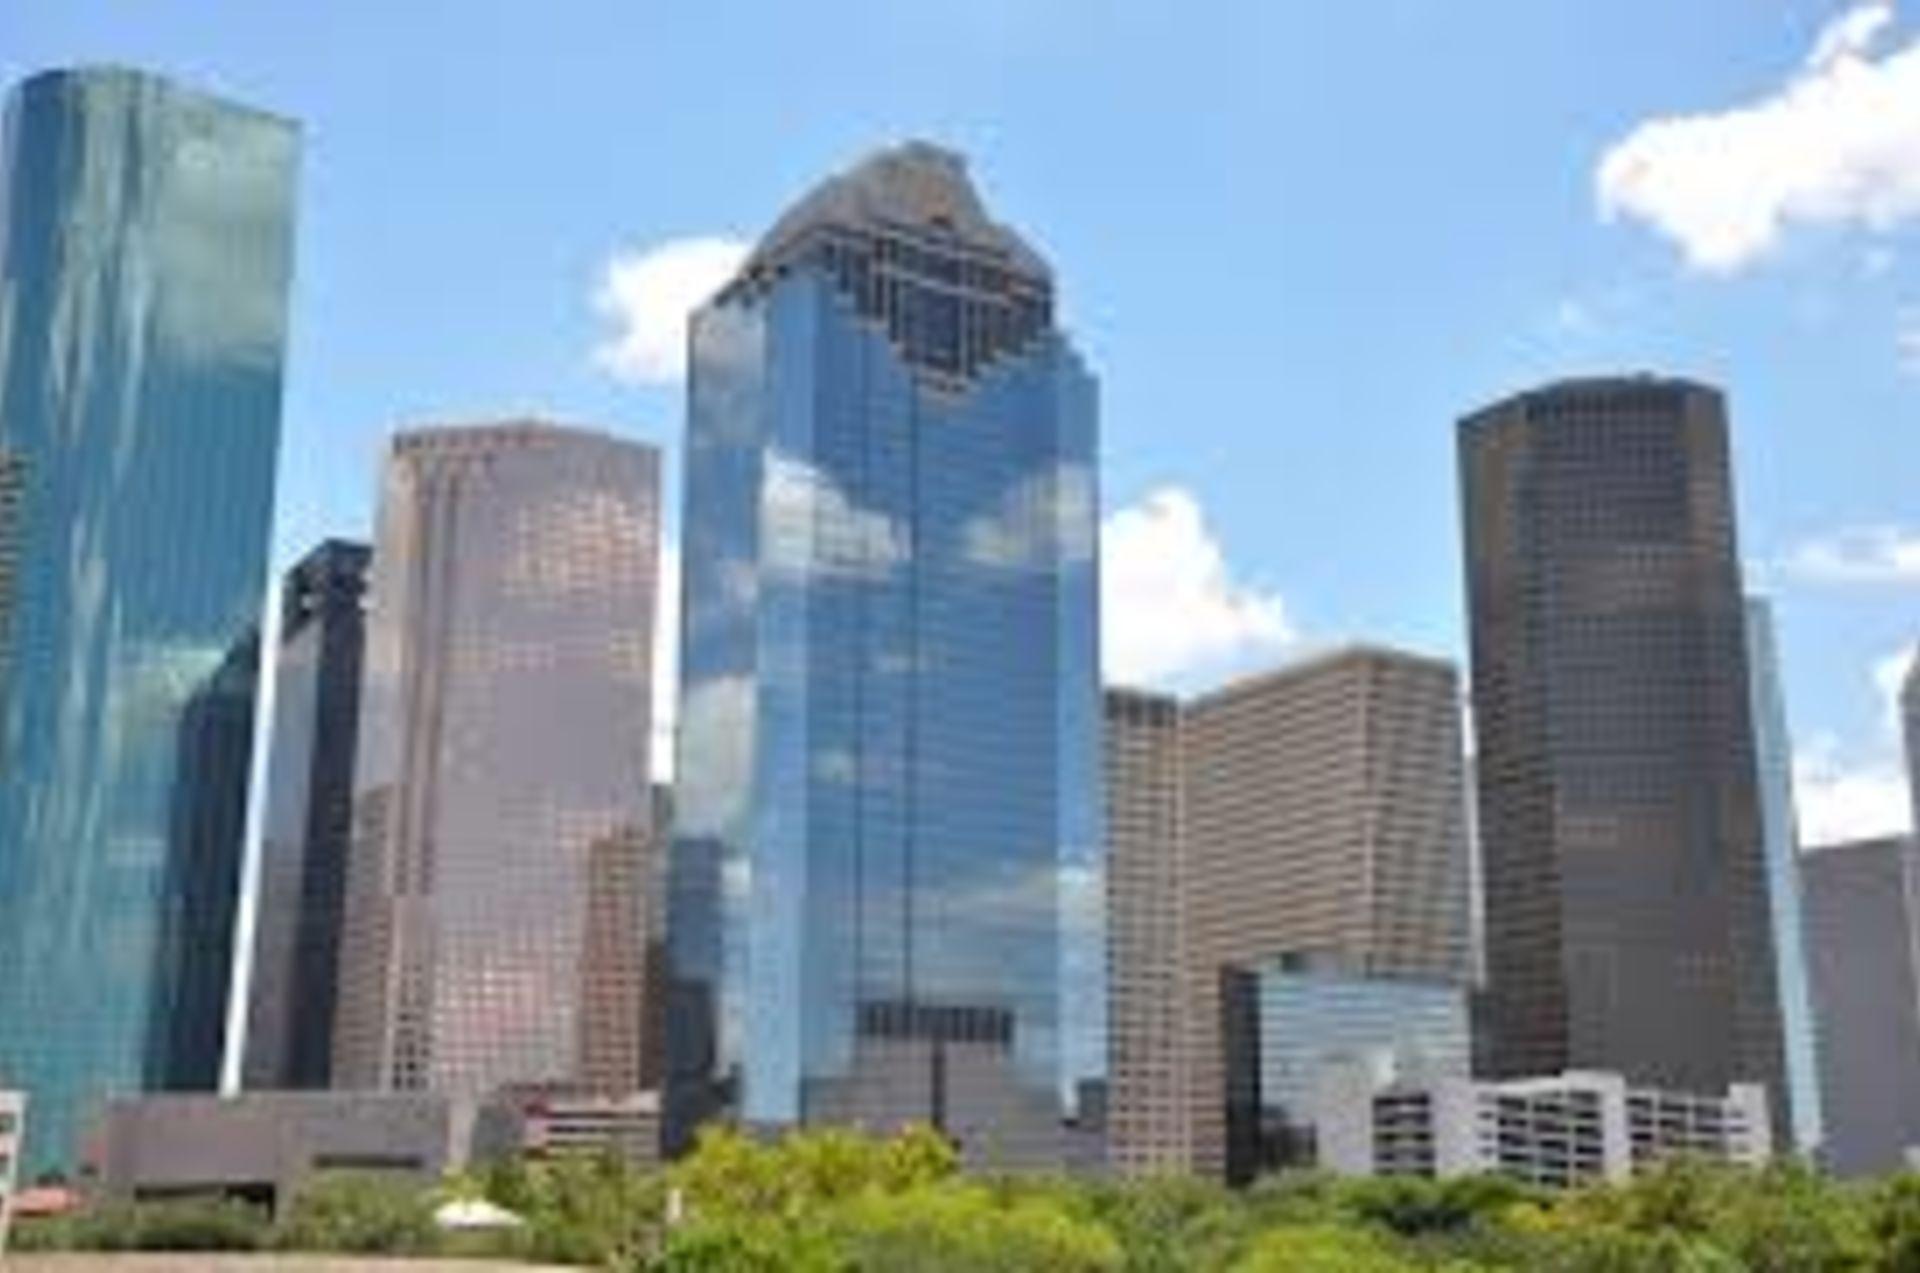 The Houston market update in under five minutes!